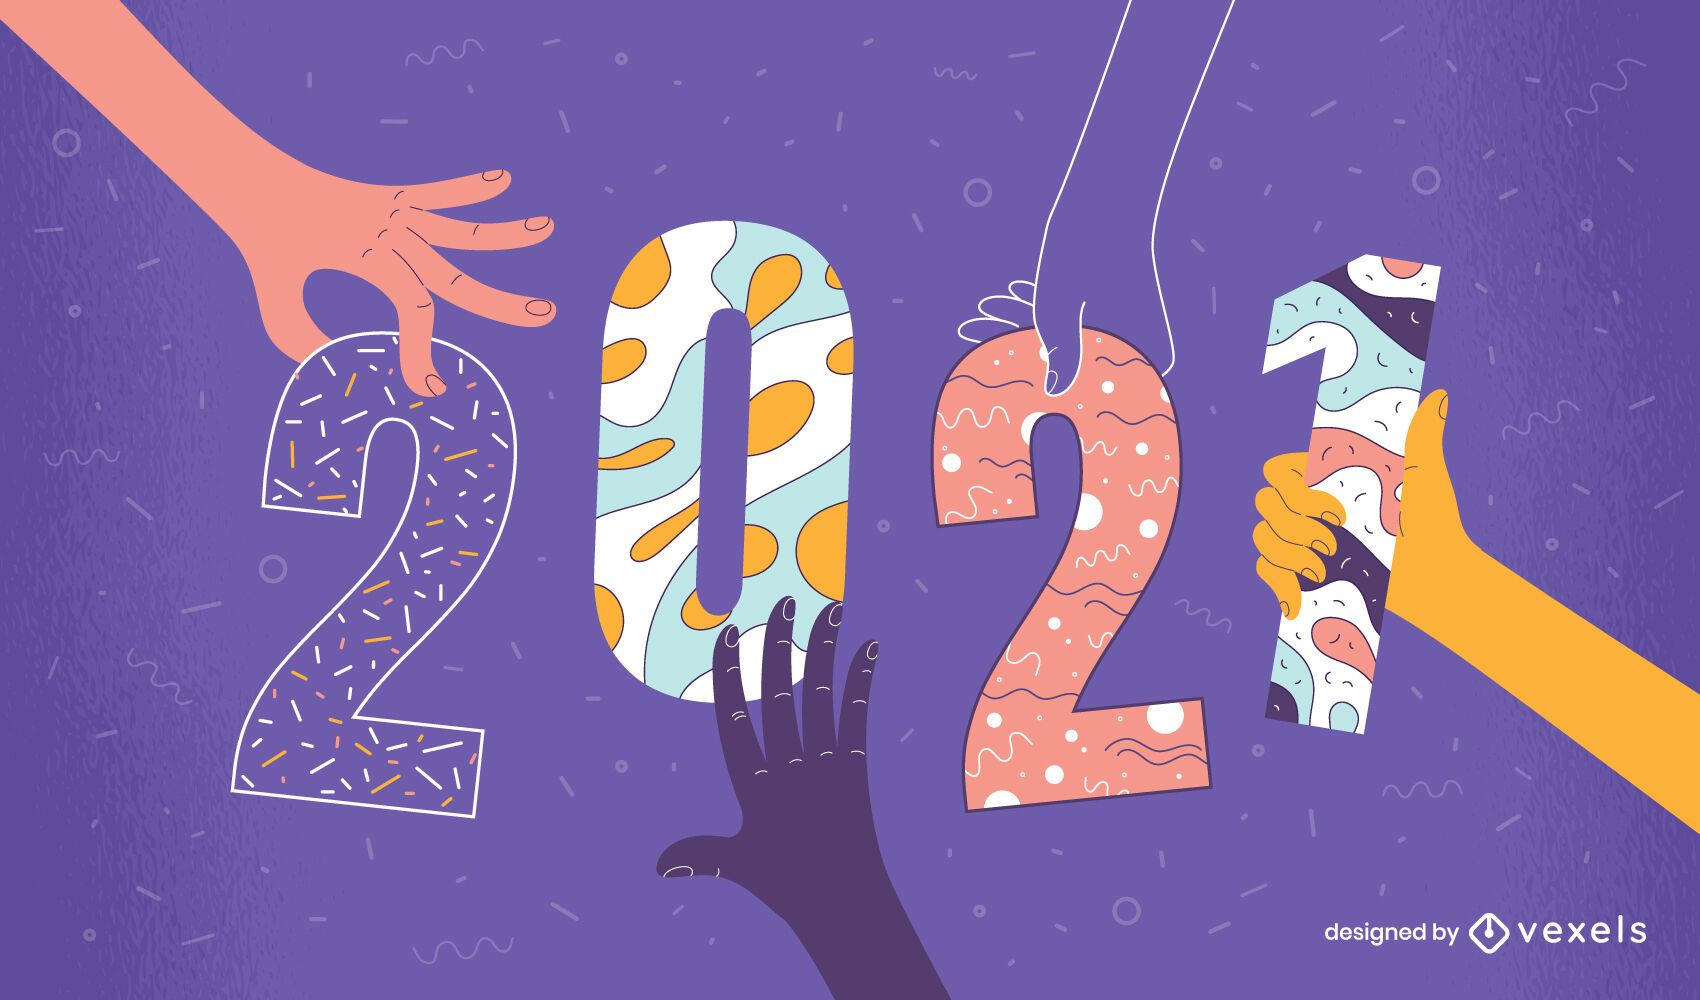 2021 colorful illustration design